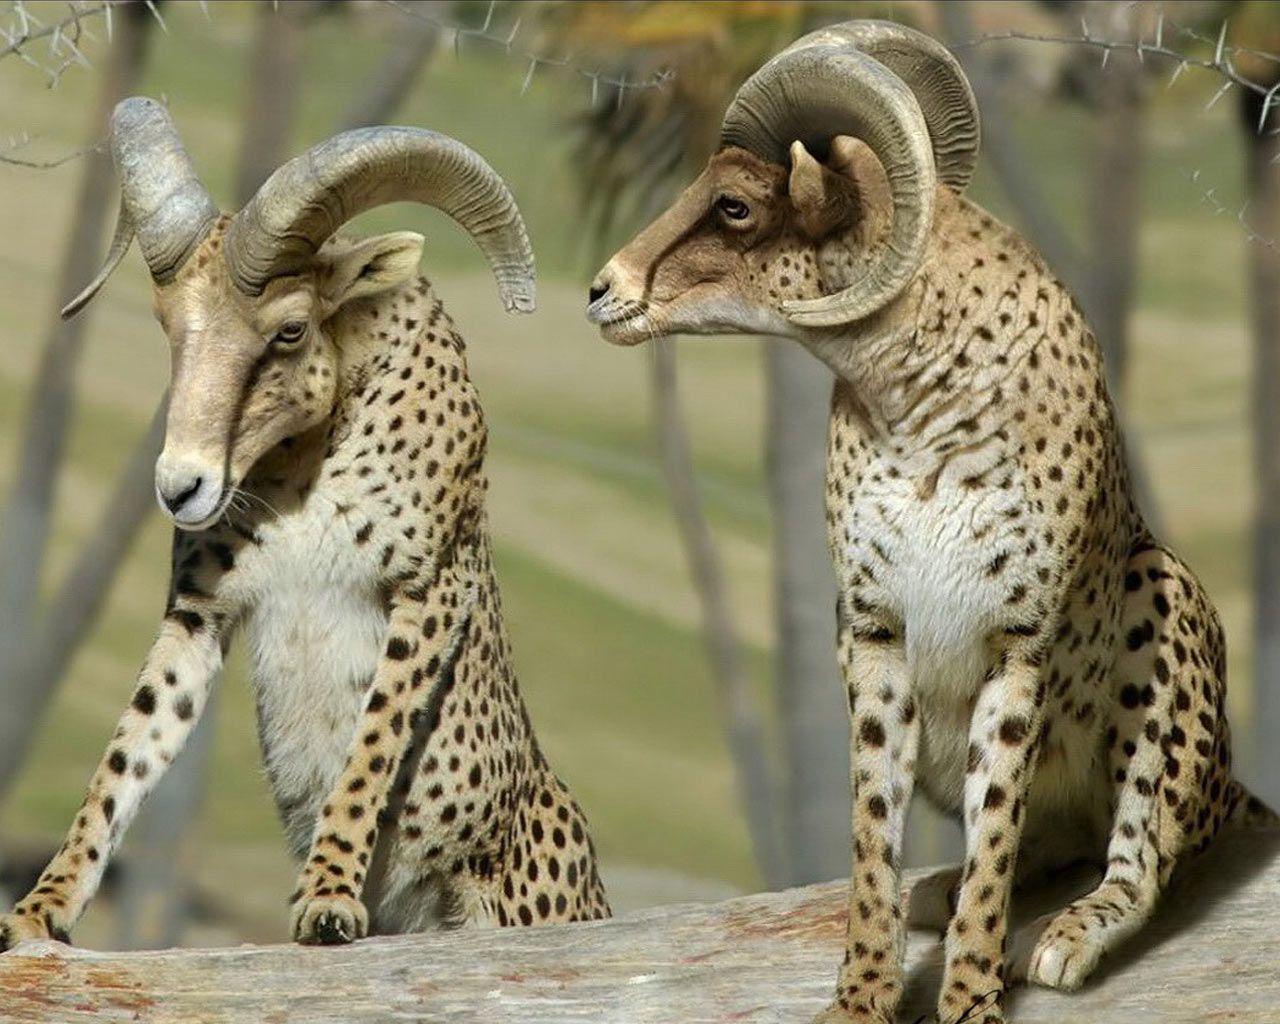 cheetah lion hybrid - Google Search | Funny | Pinterest ...